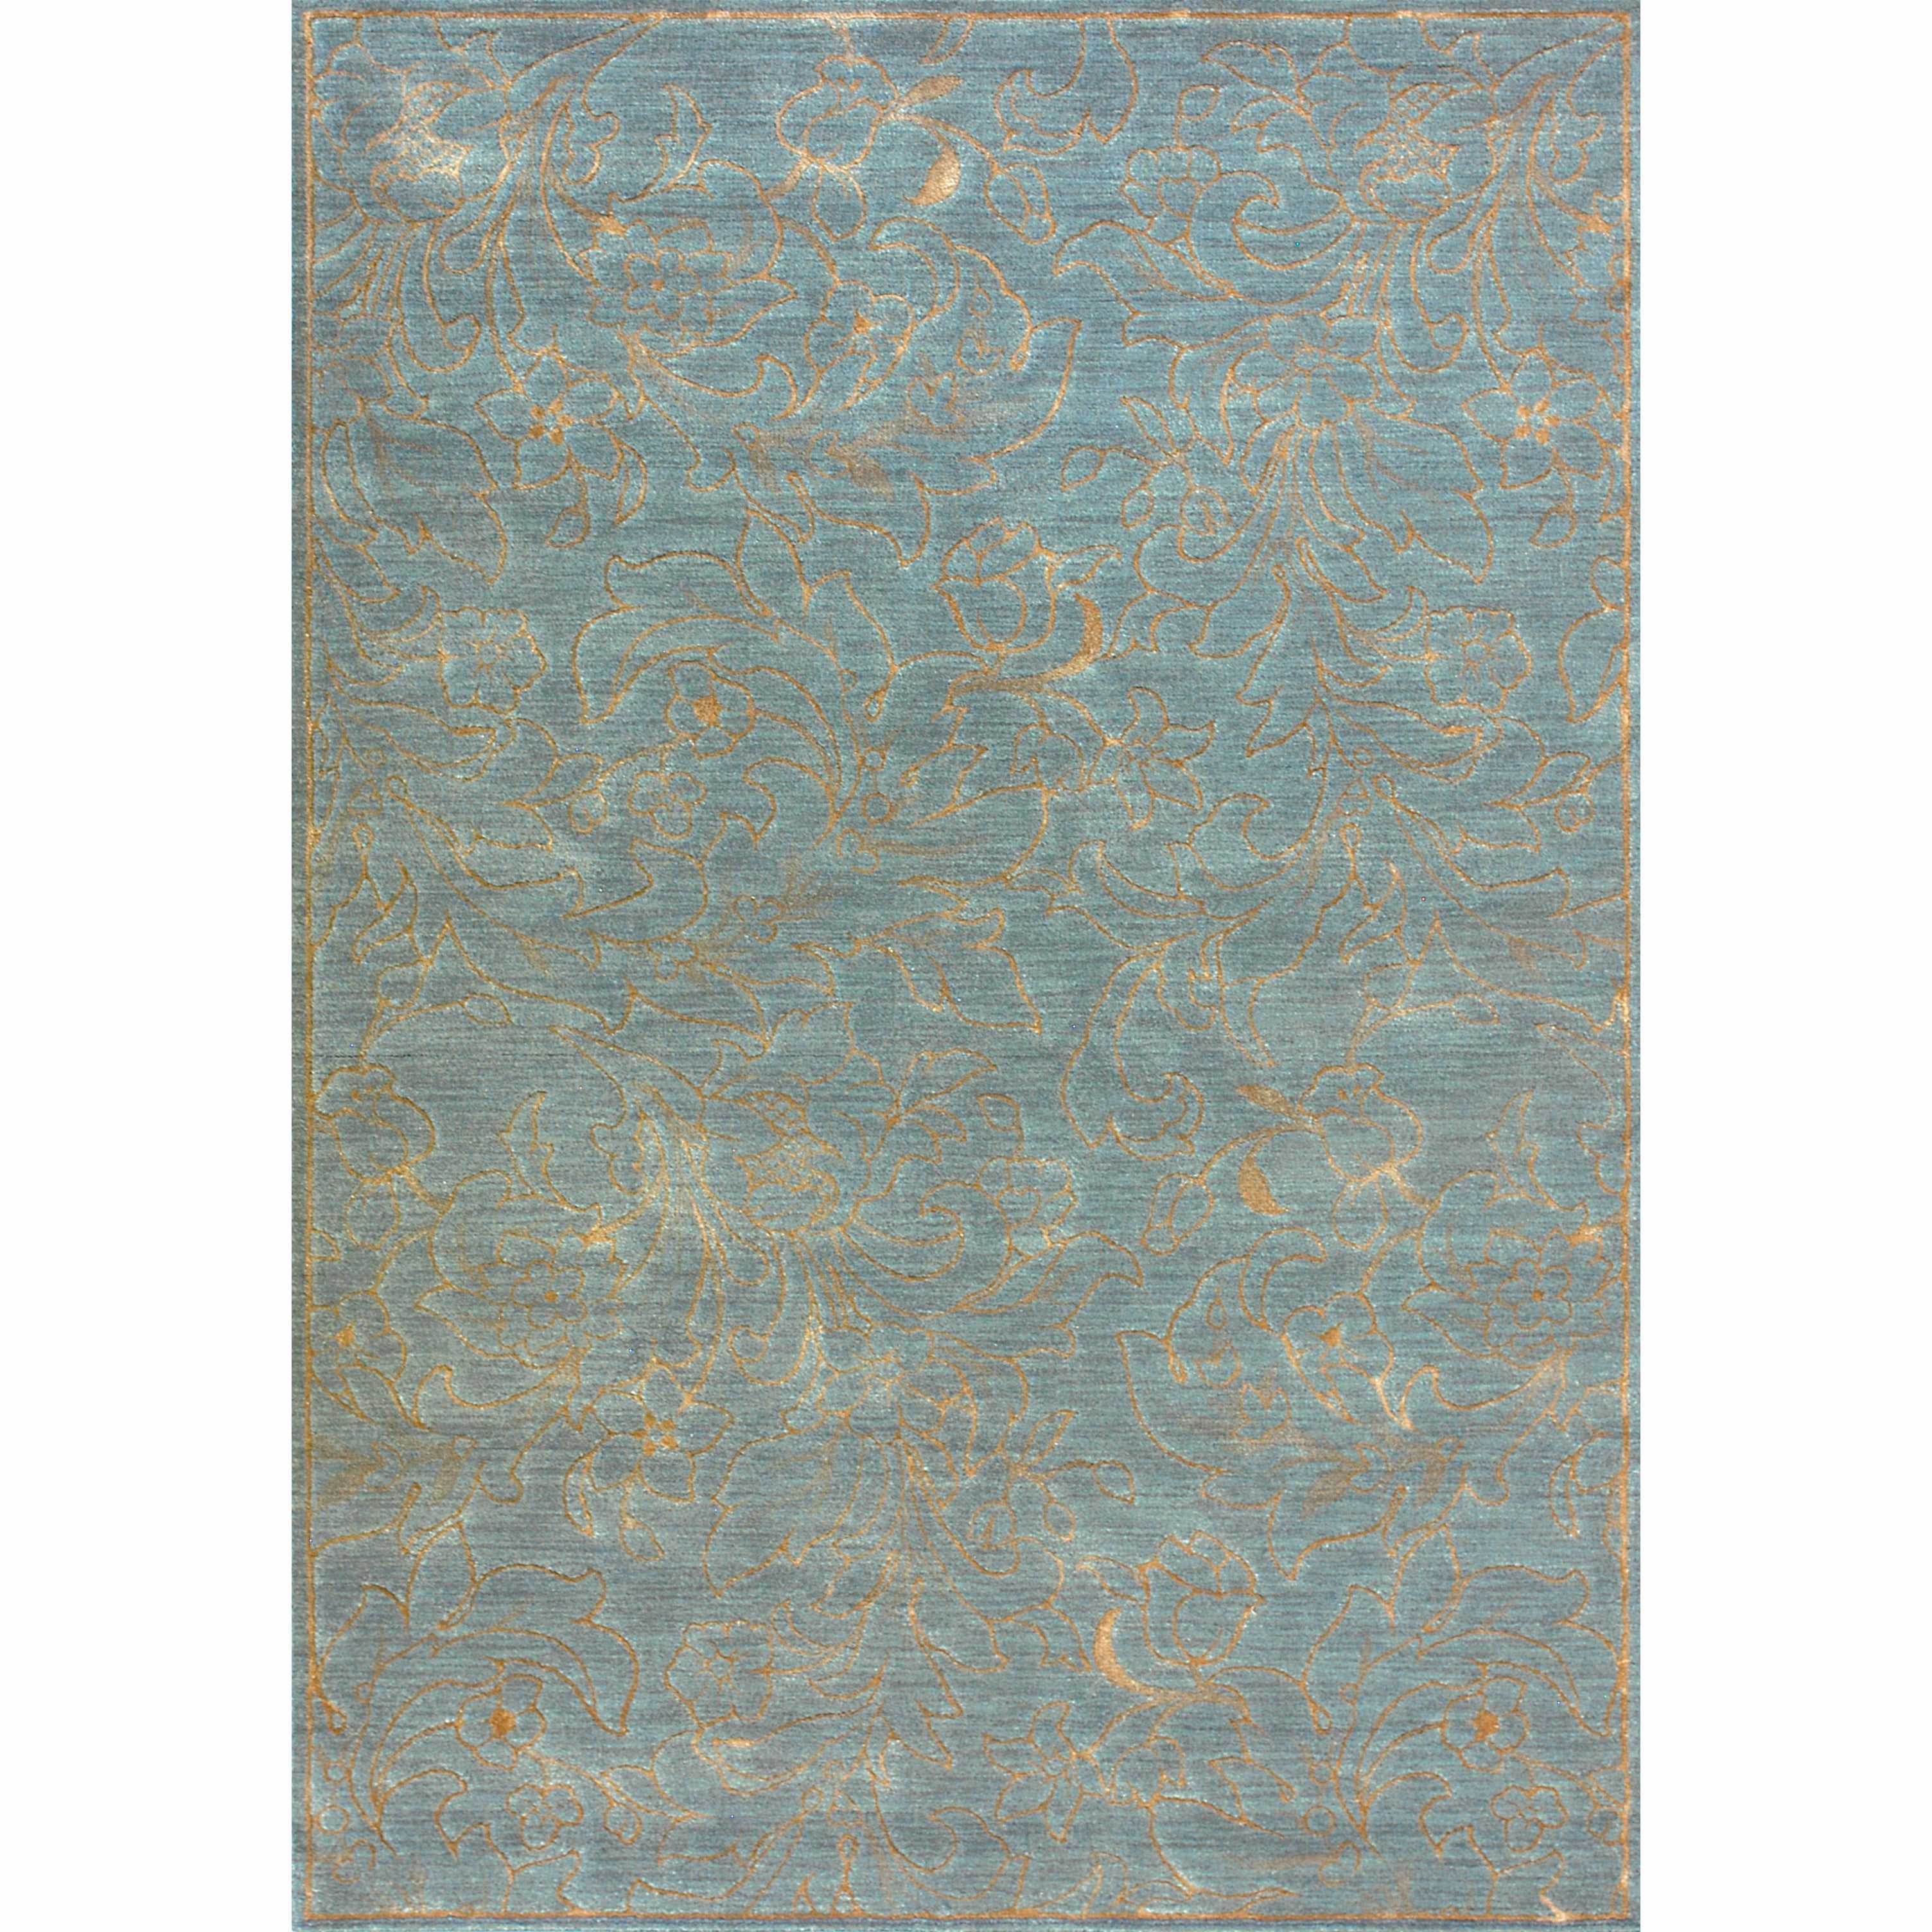 Astor Blue Rug (7'7 x 10'5)